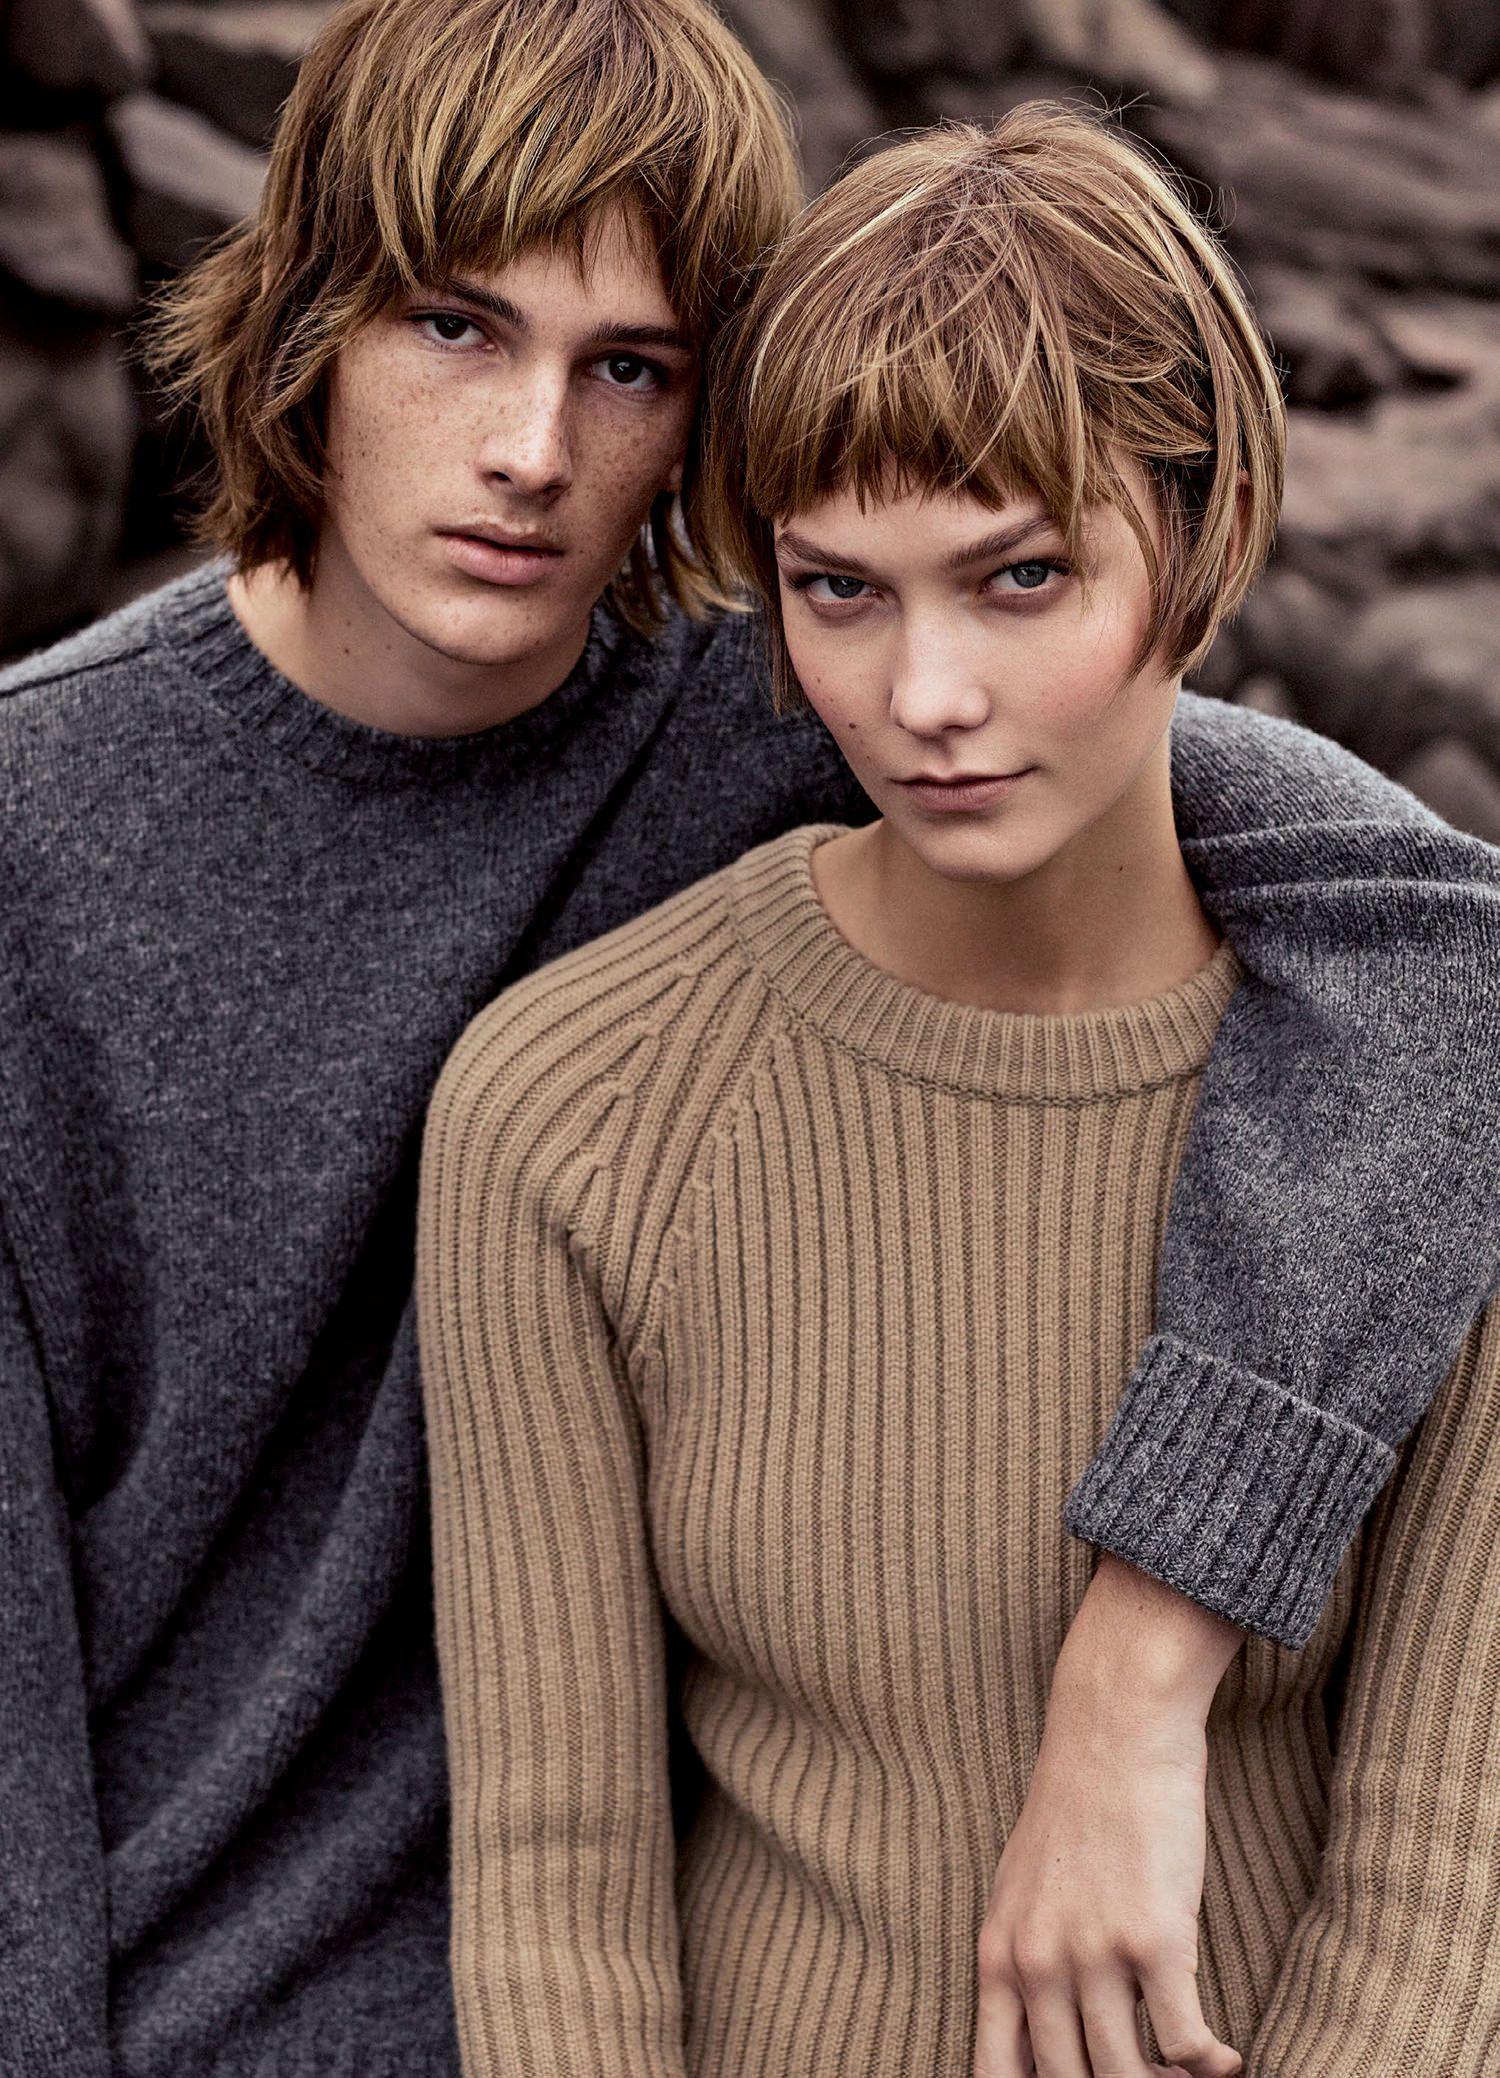 Karlie Kloss & Dylan Brosnan by Mikael Jansson for Vogue US November 2015